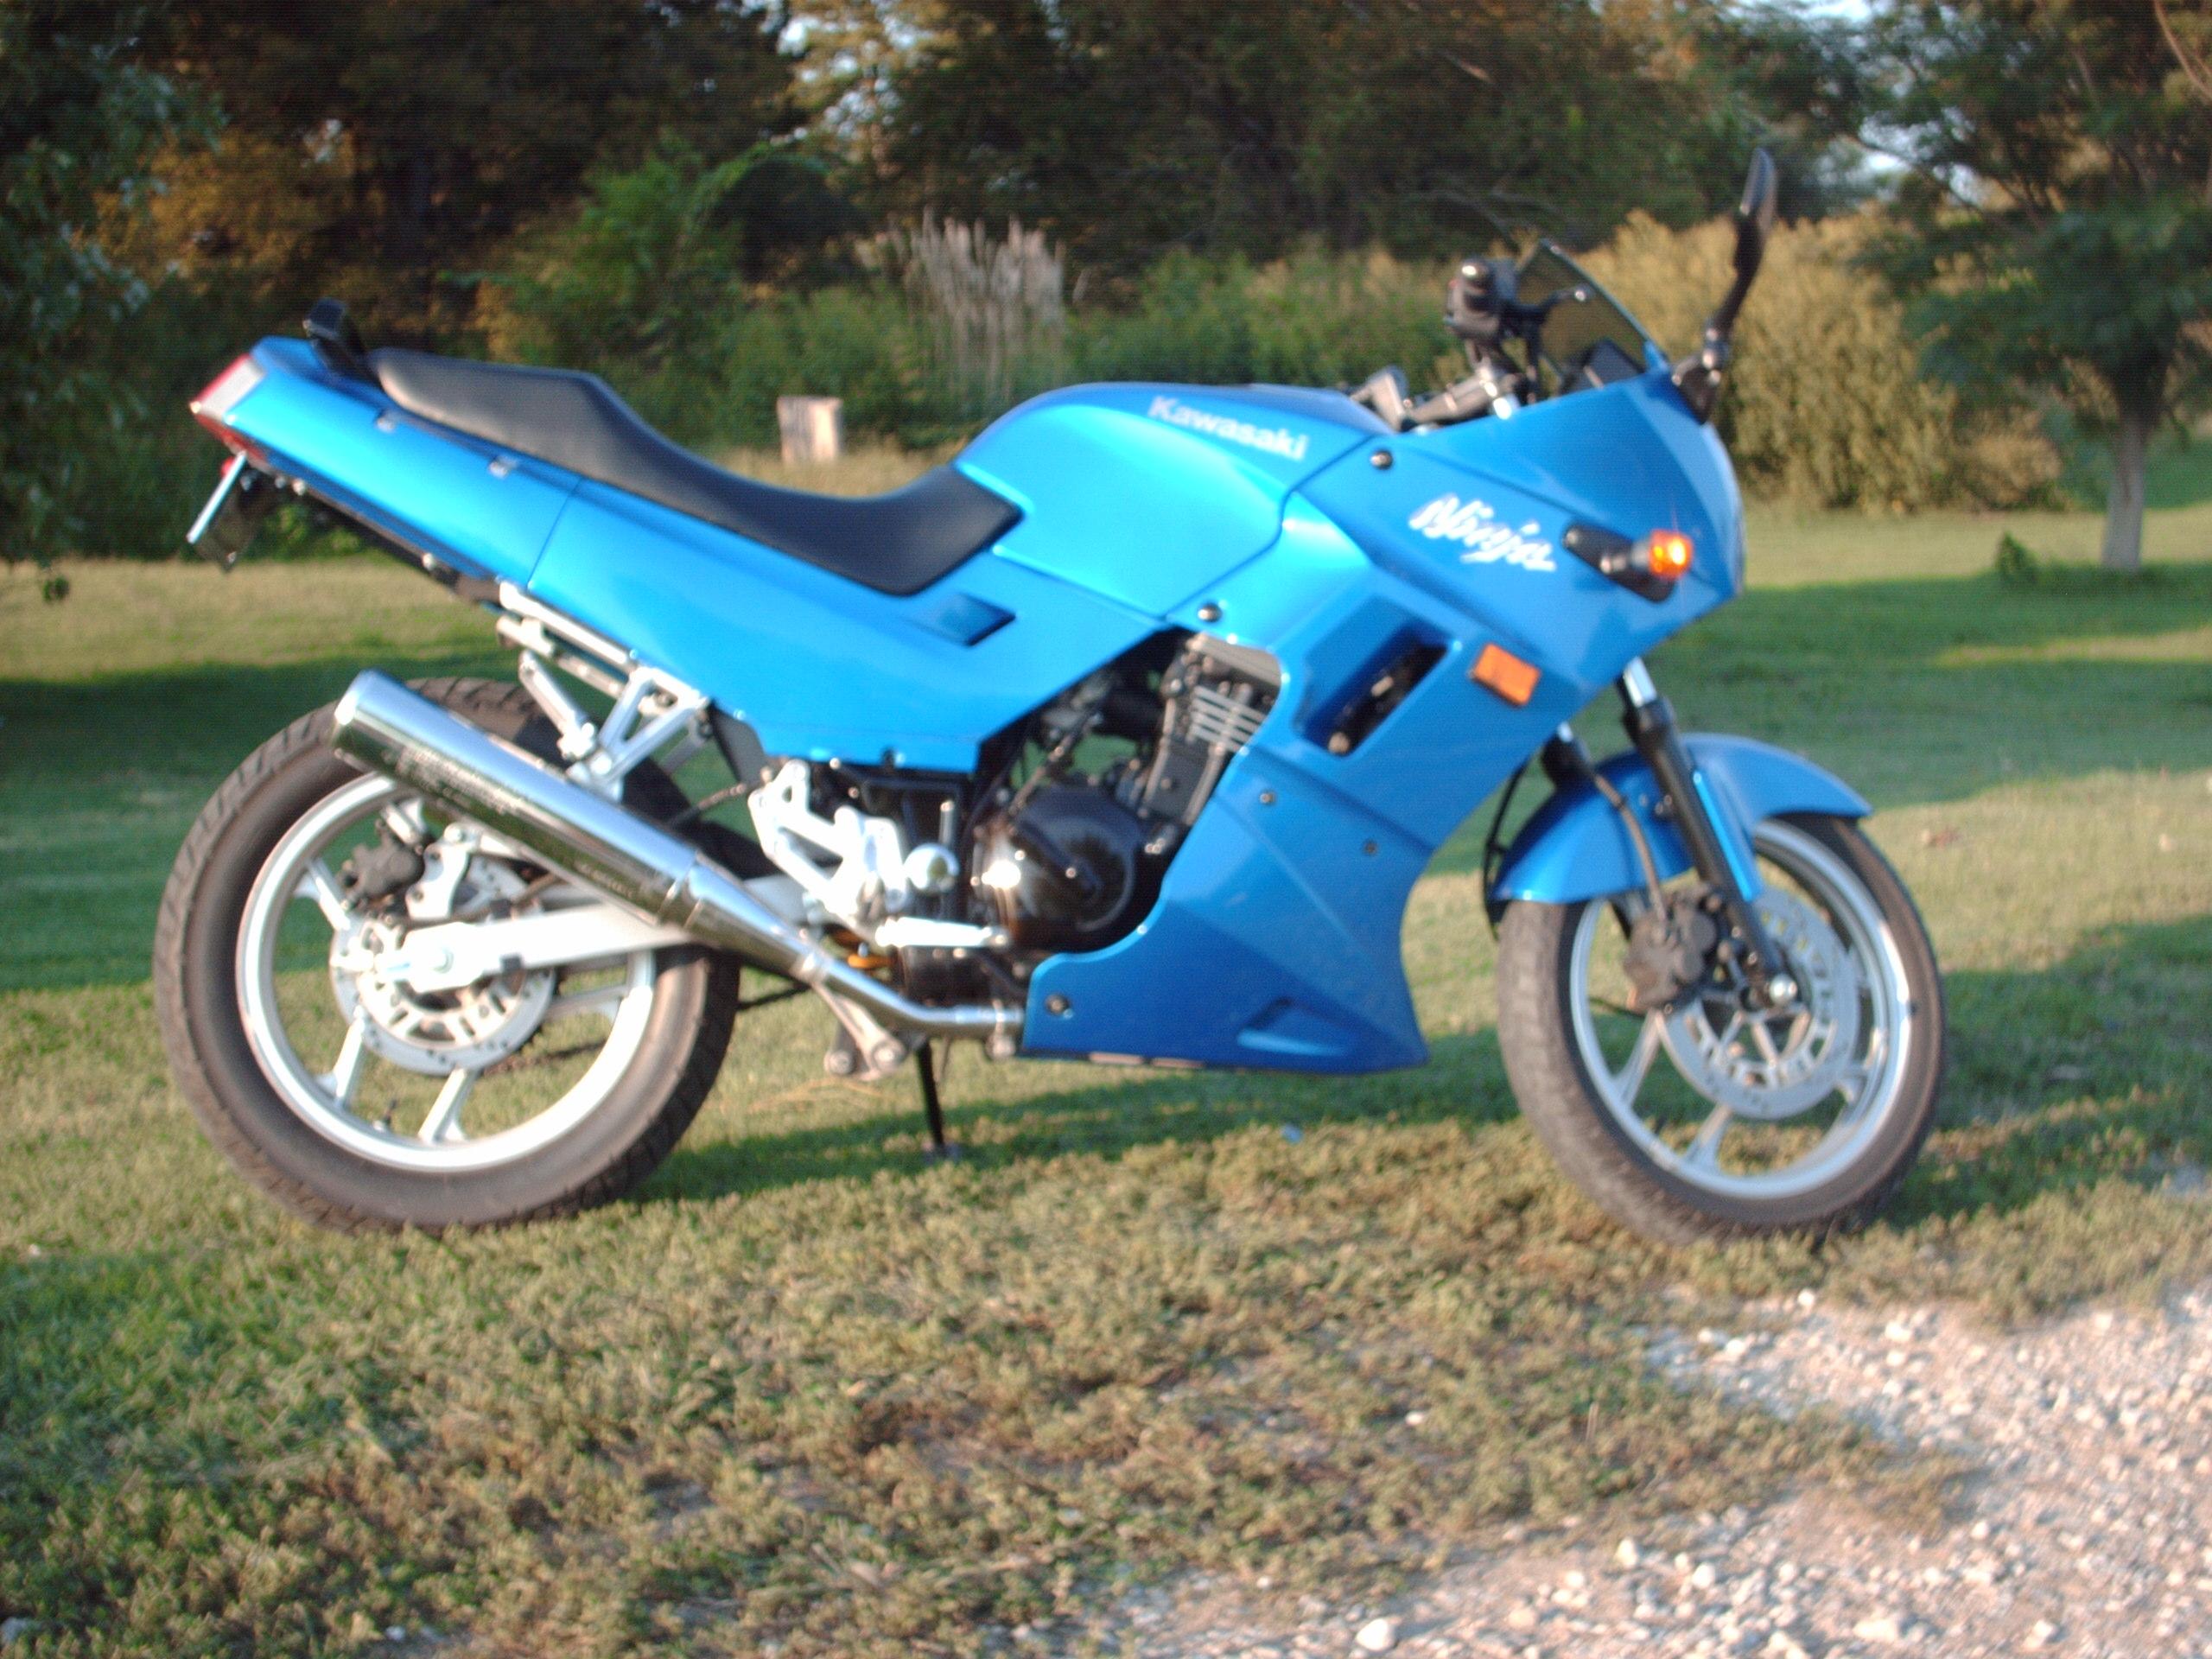 2007 250 r - sportbikes